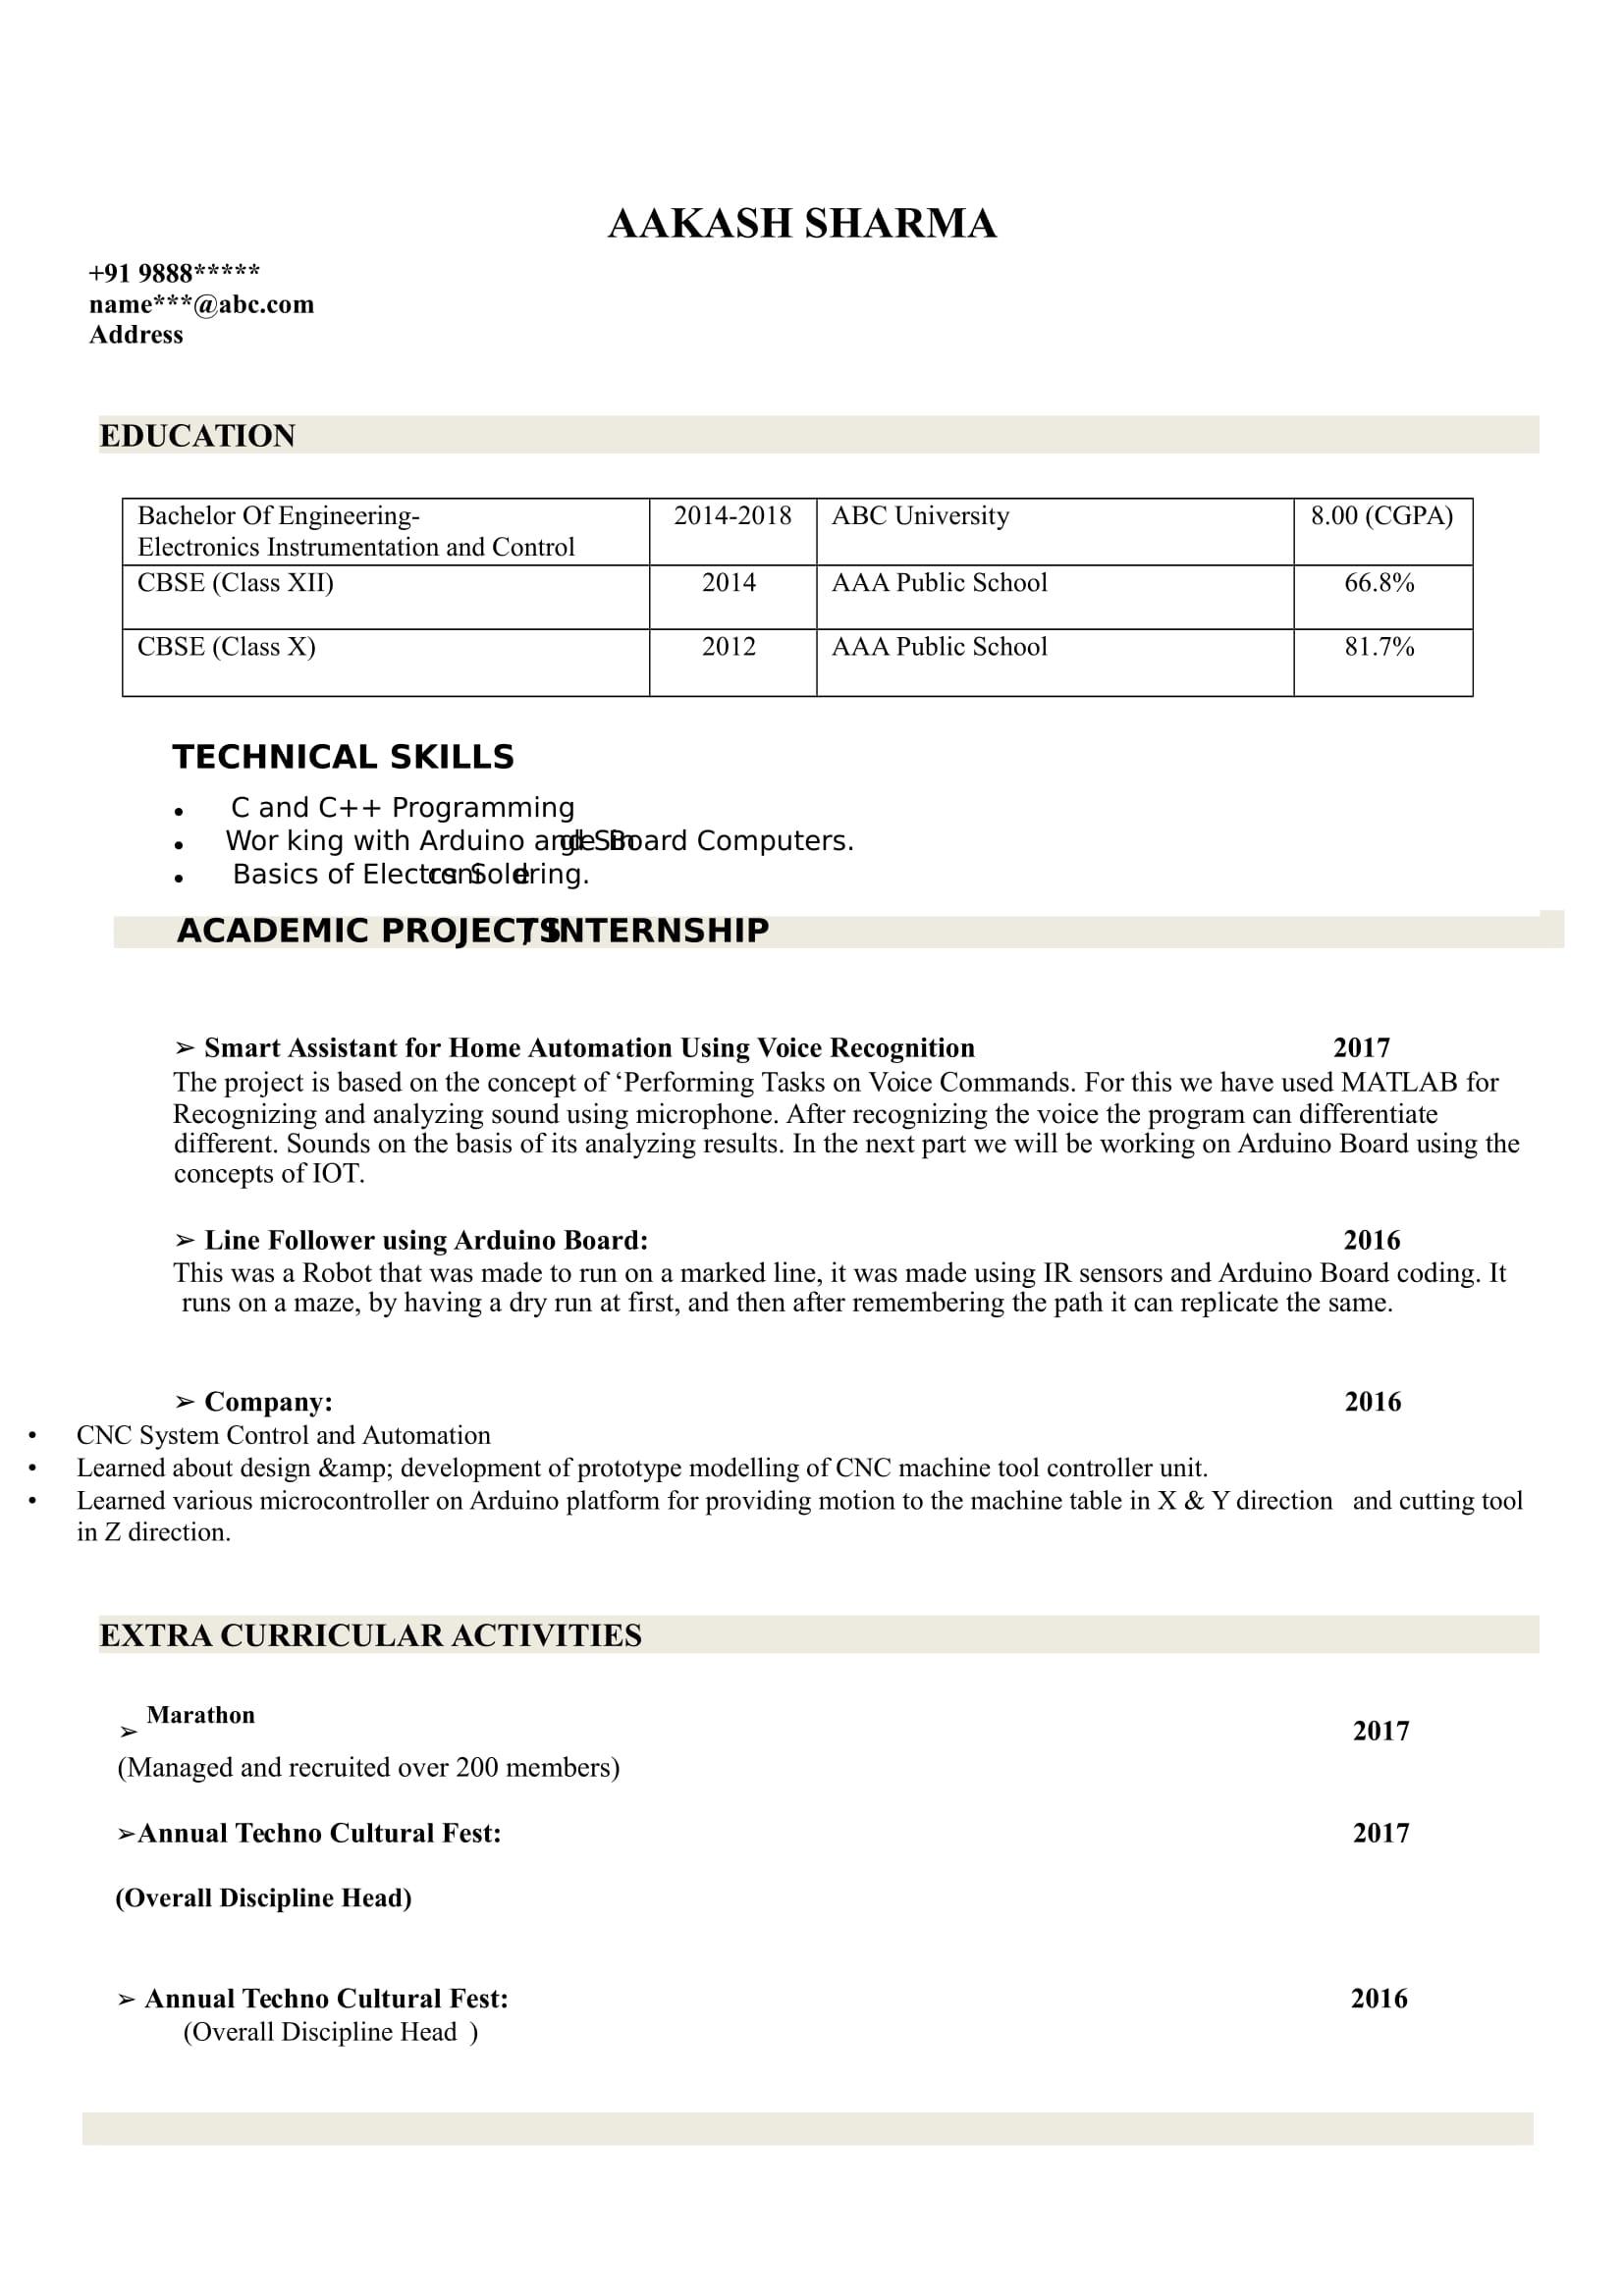 sample electronics and instrumentation intern resume